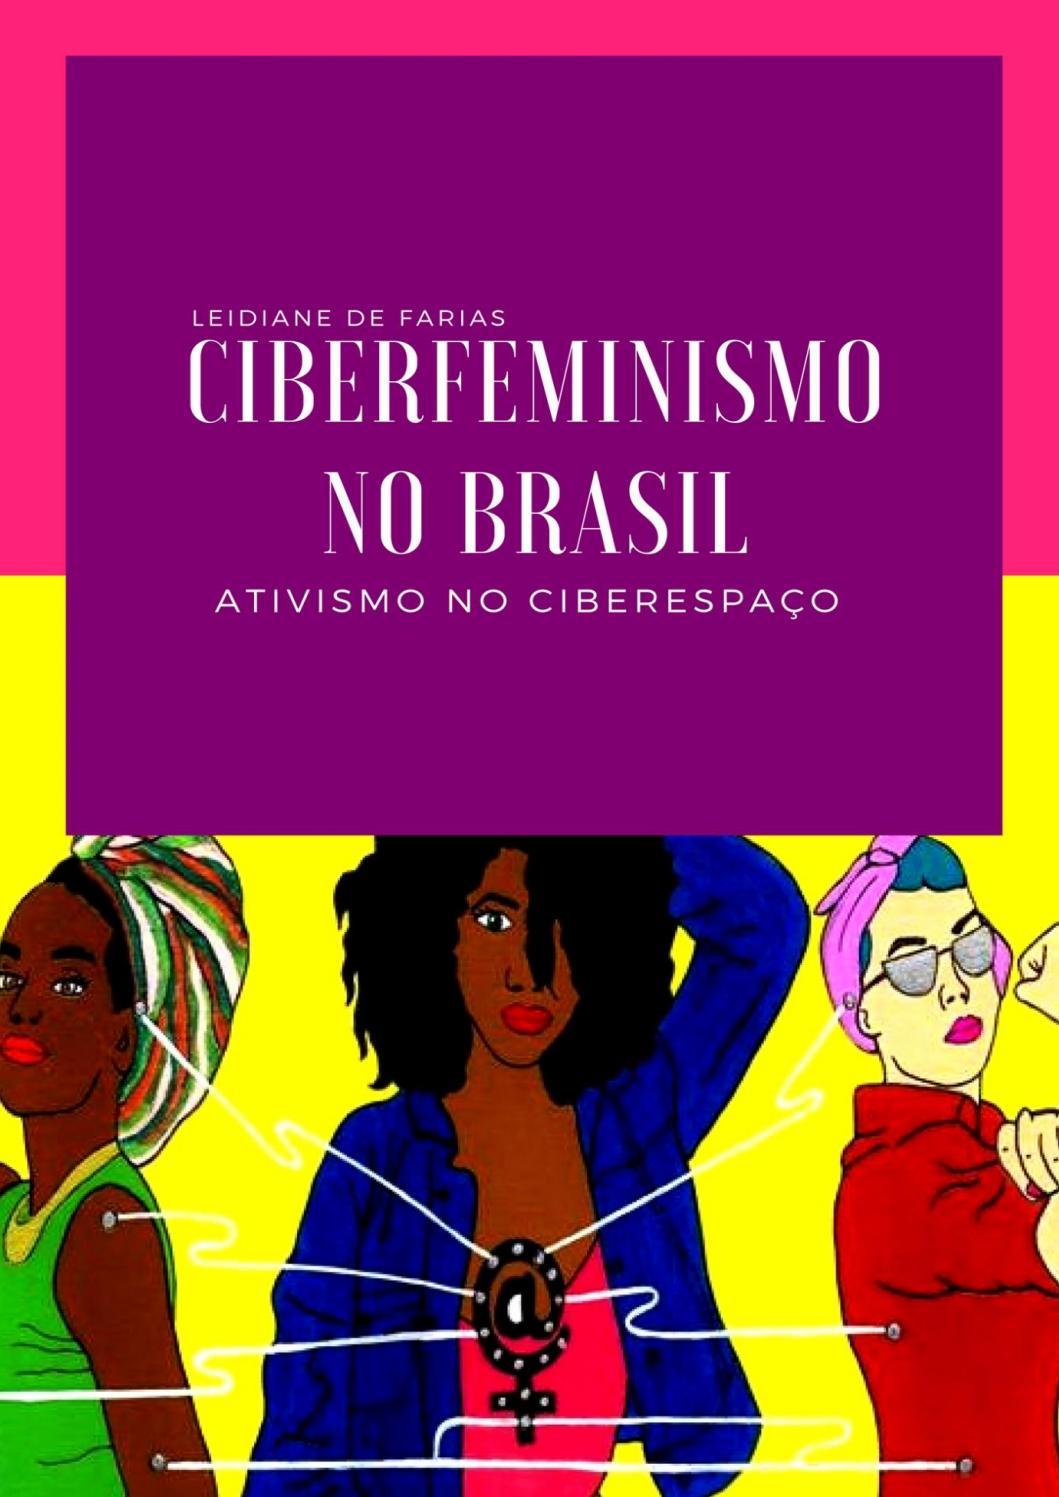 Ciberfeminismos no brasil ativismo no ciberespao by ciberfeminismo ciberfeminismos no brasil ativismo no ciberespao by ciberfeminismo issuu fandeluxe Image collections